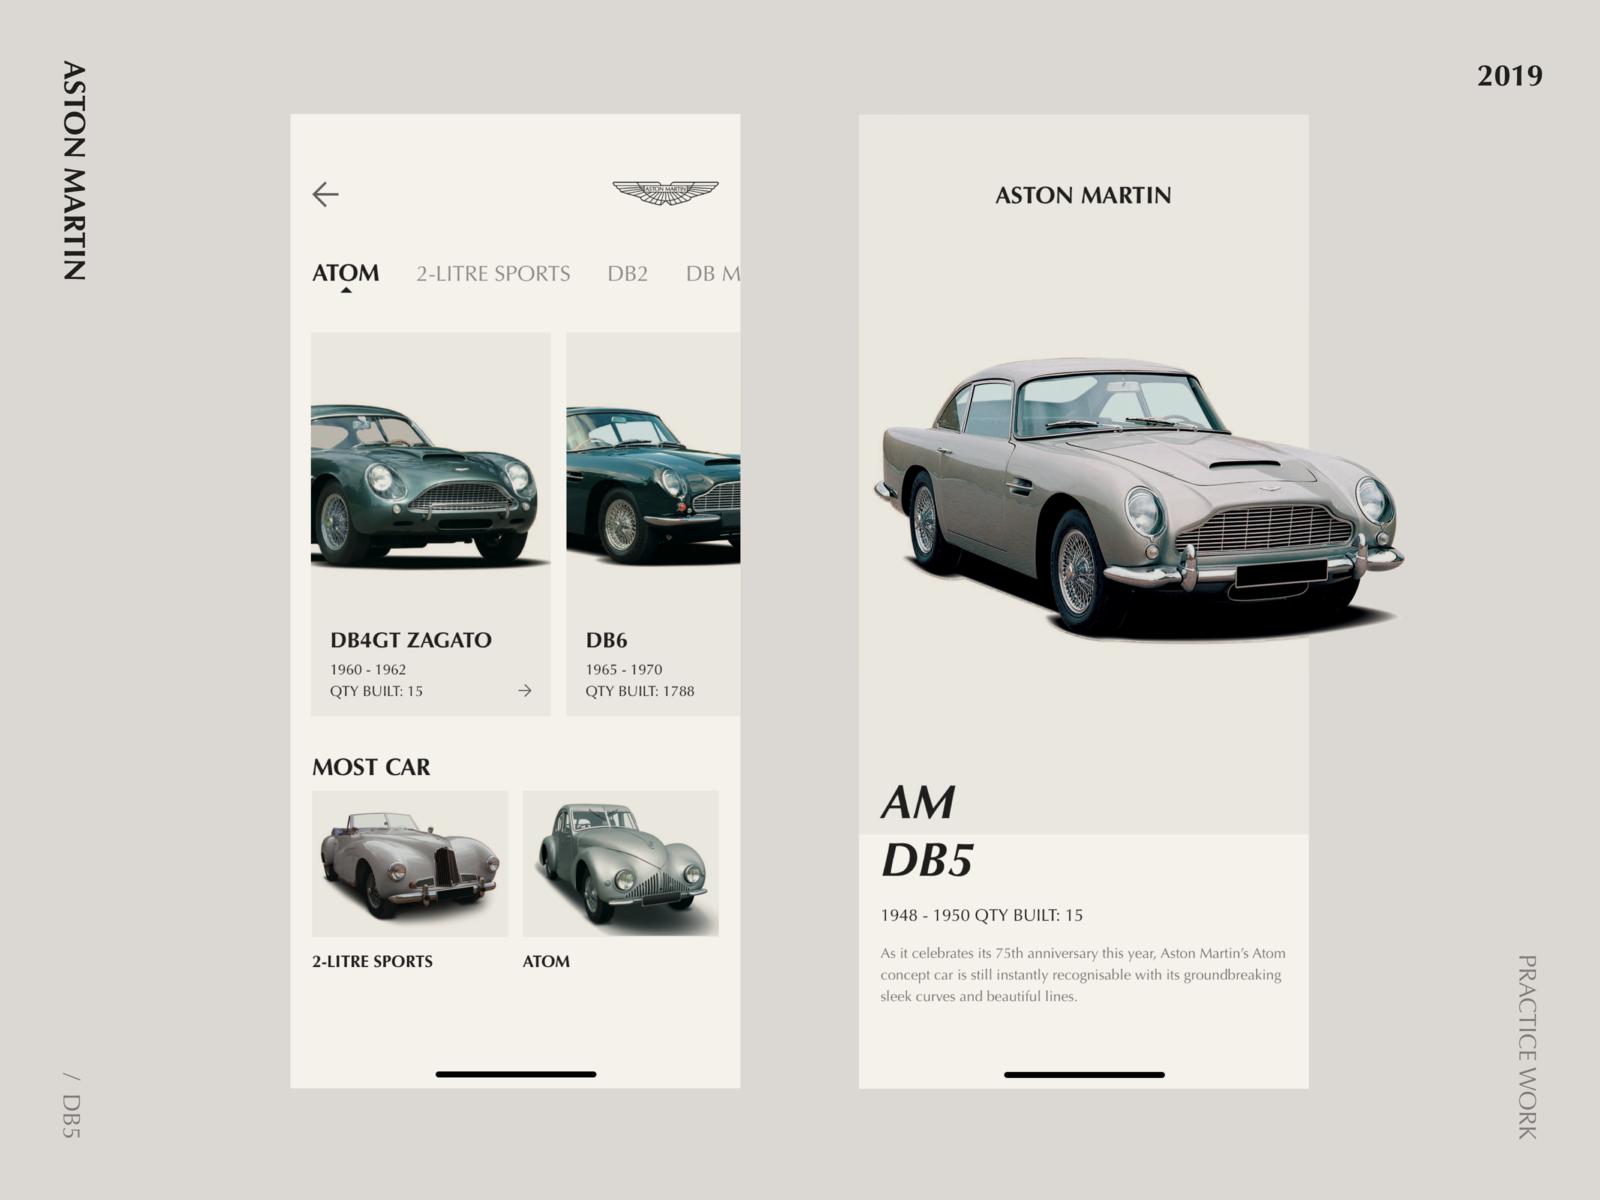 Aston Martin App Practice Work By Harding On Dribbble